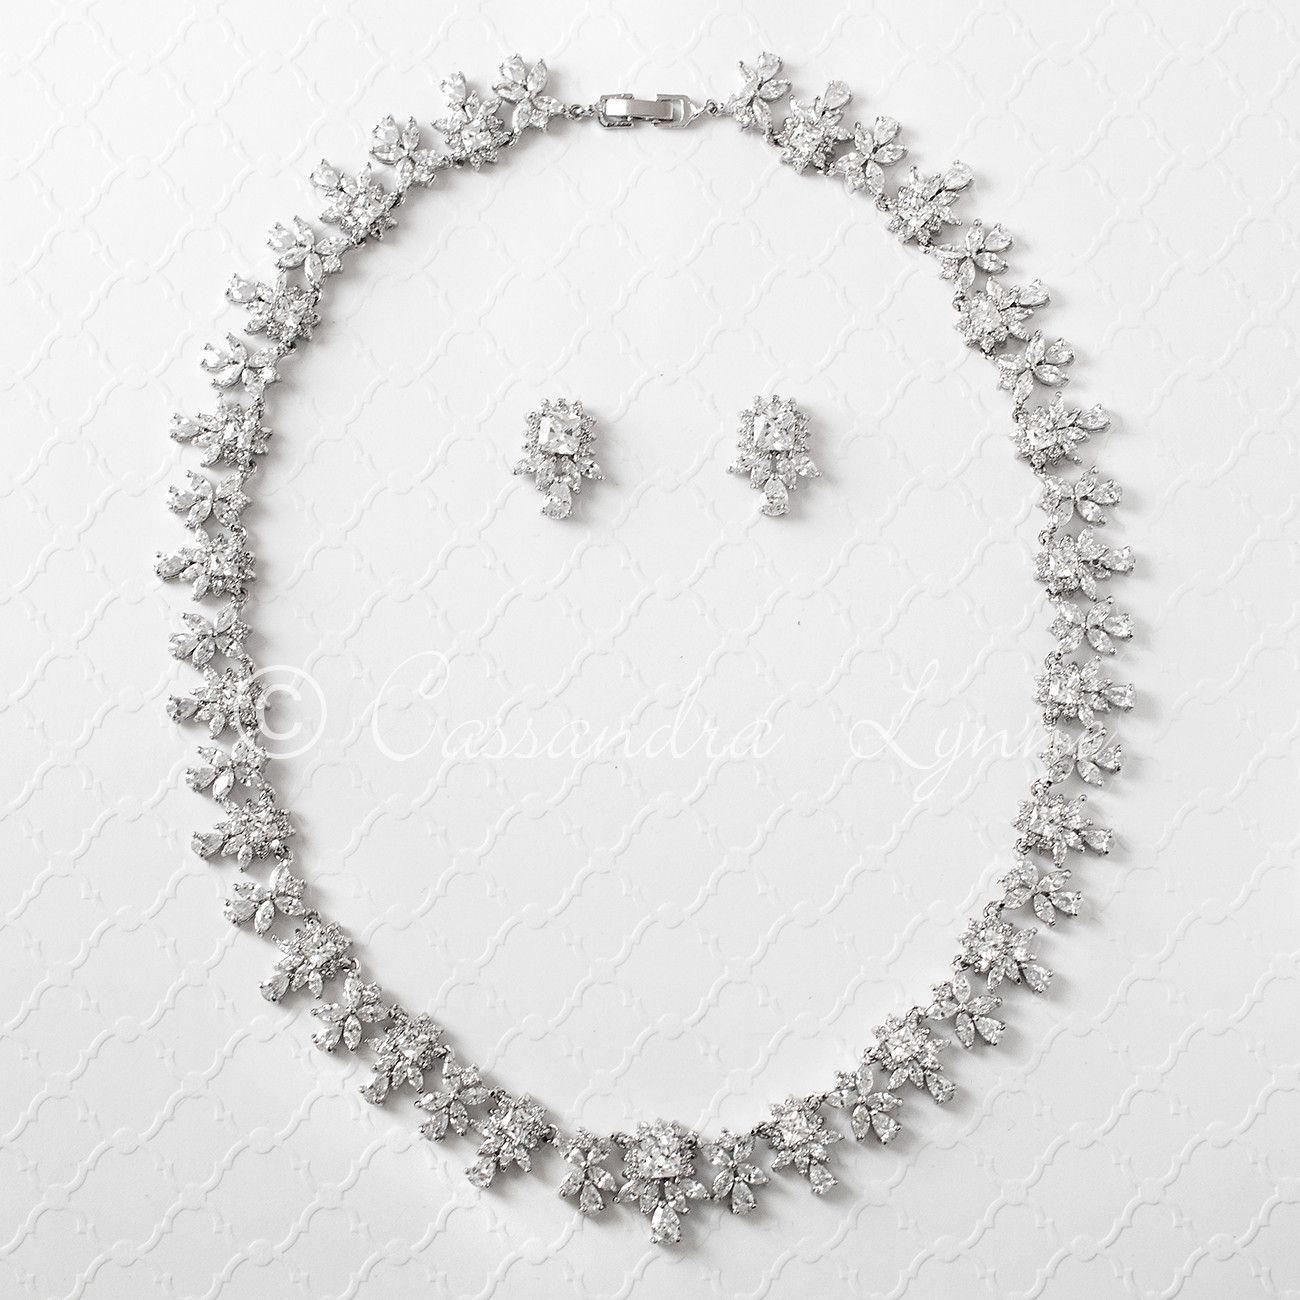 Square cz accented bridal jewelry set modern jewelry pinterest